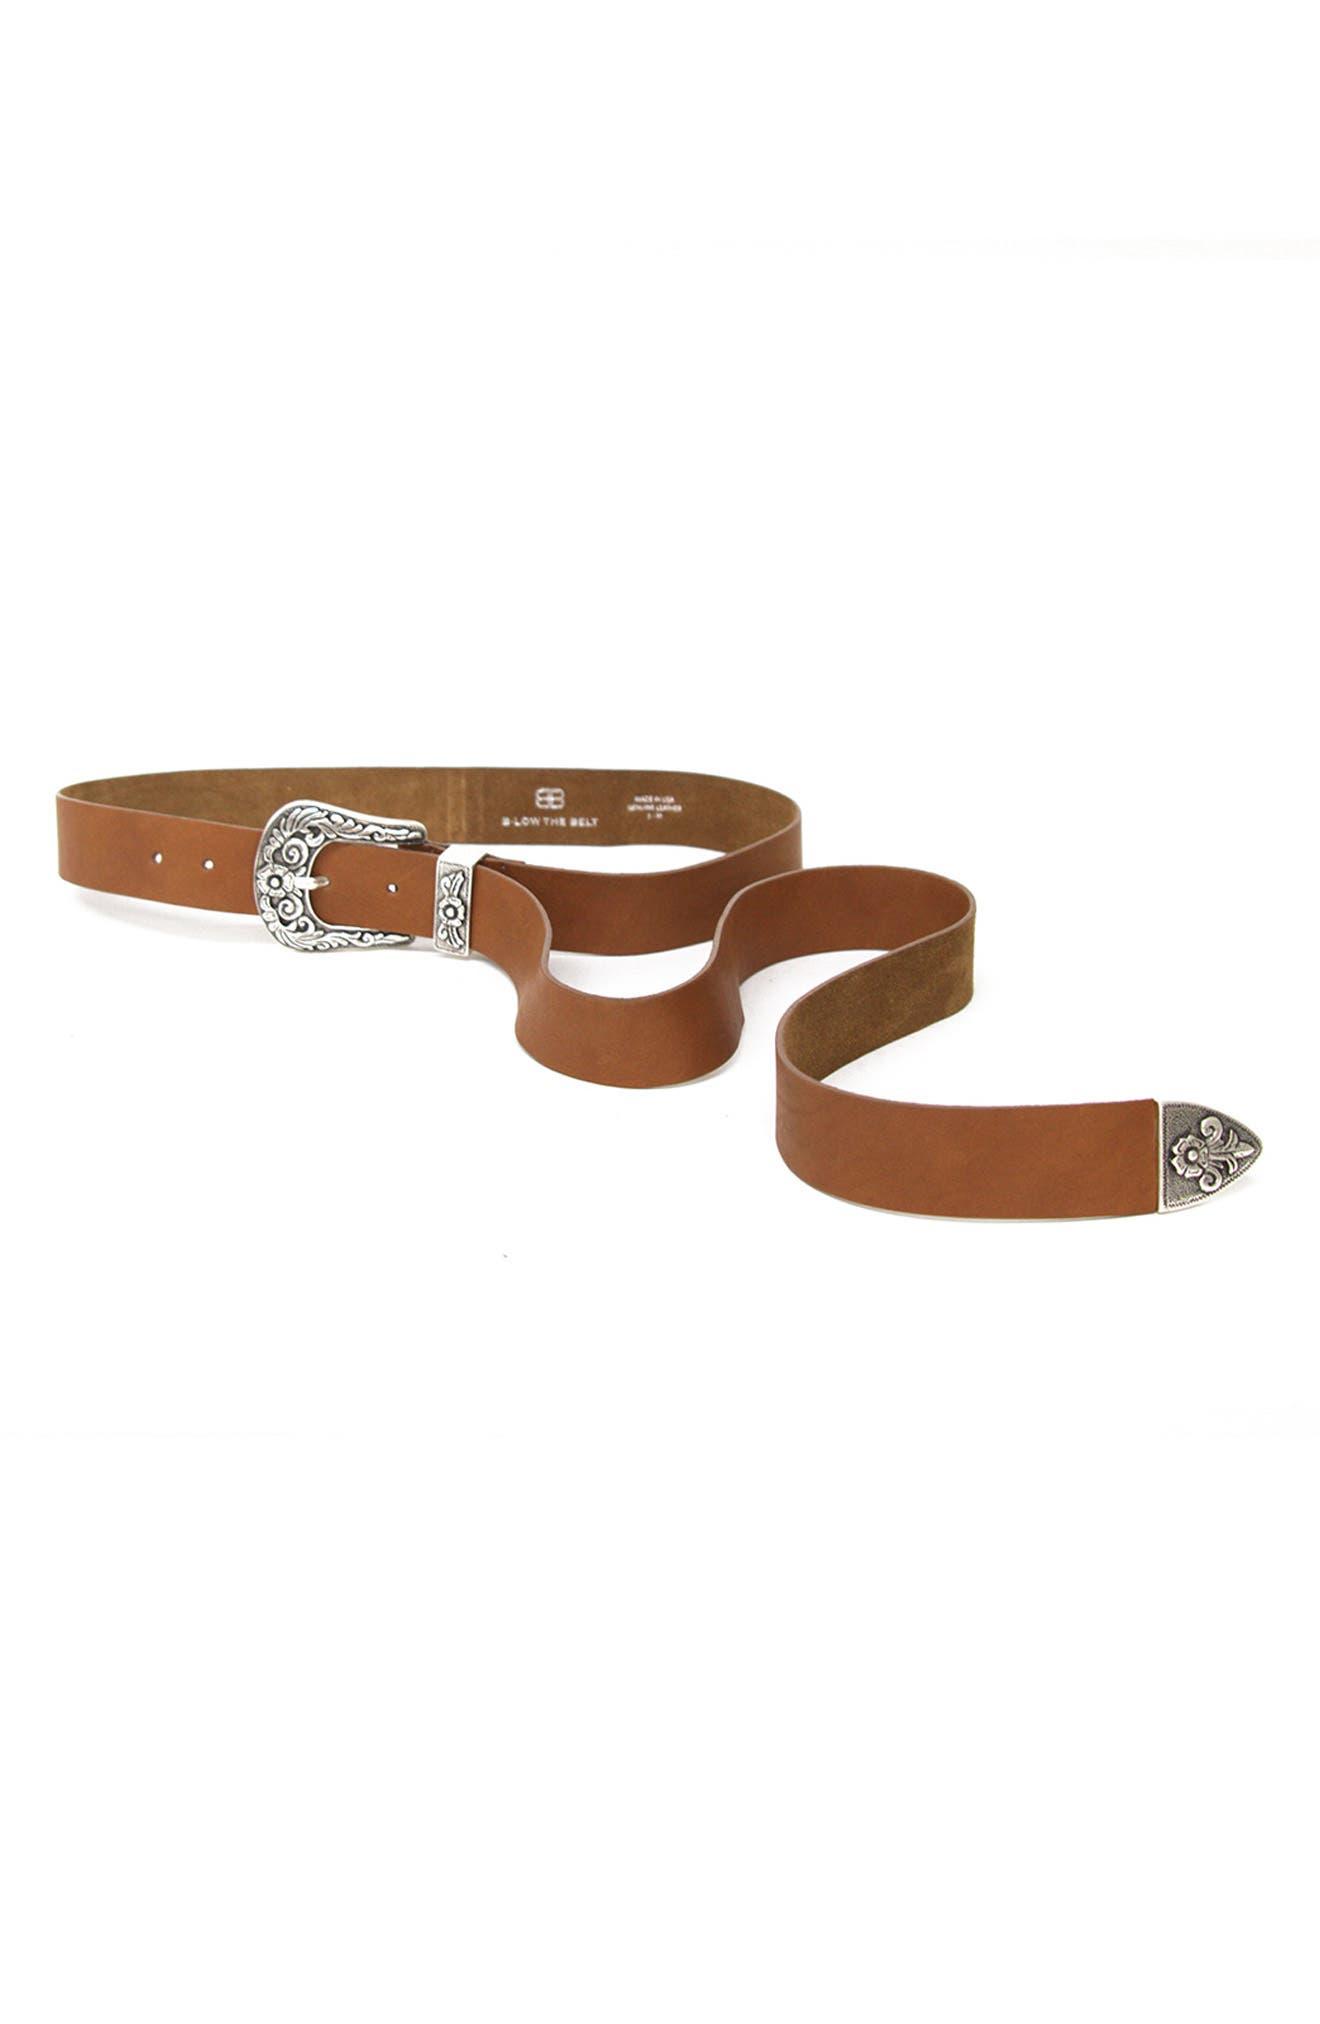 B-Low The Belt Royal Leather Western Belt, Cognac/ Silver